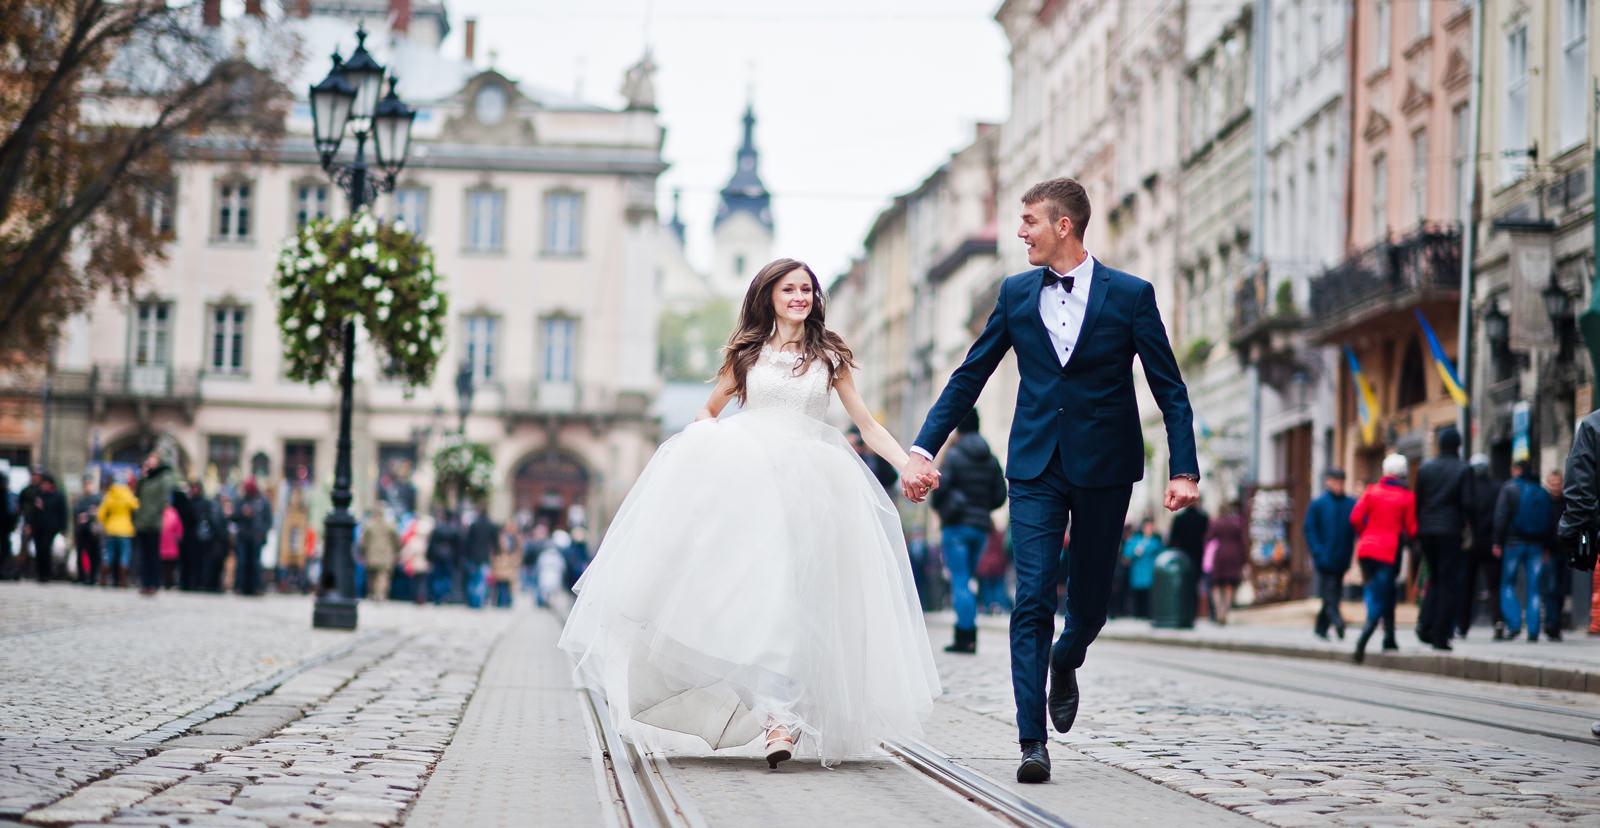 10-ways-enjoy-planning-your-wedding